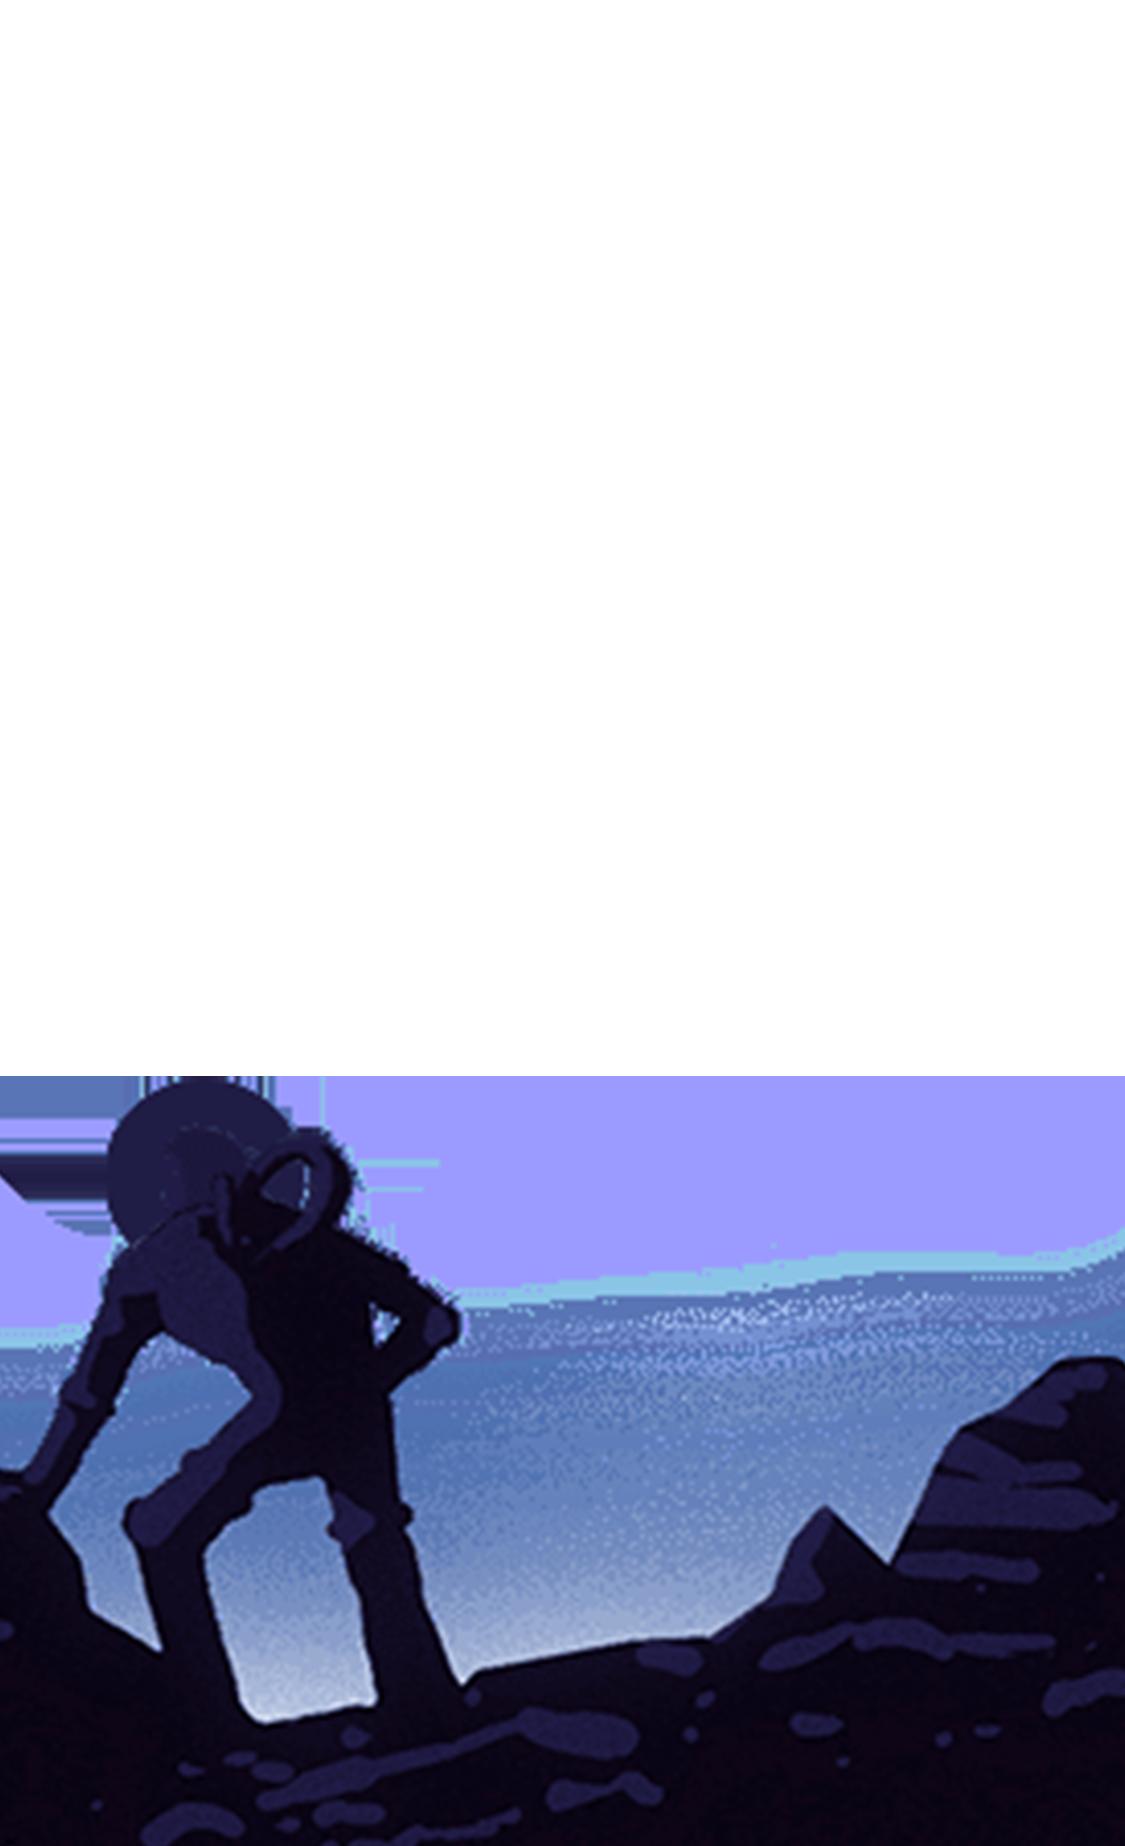 Foreground